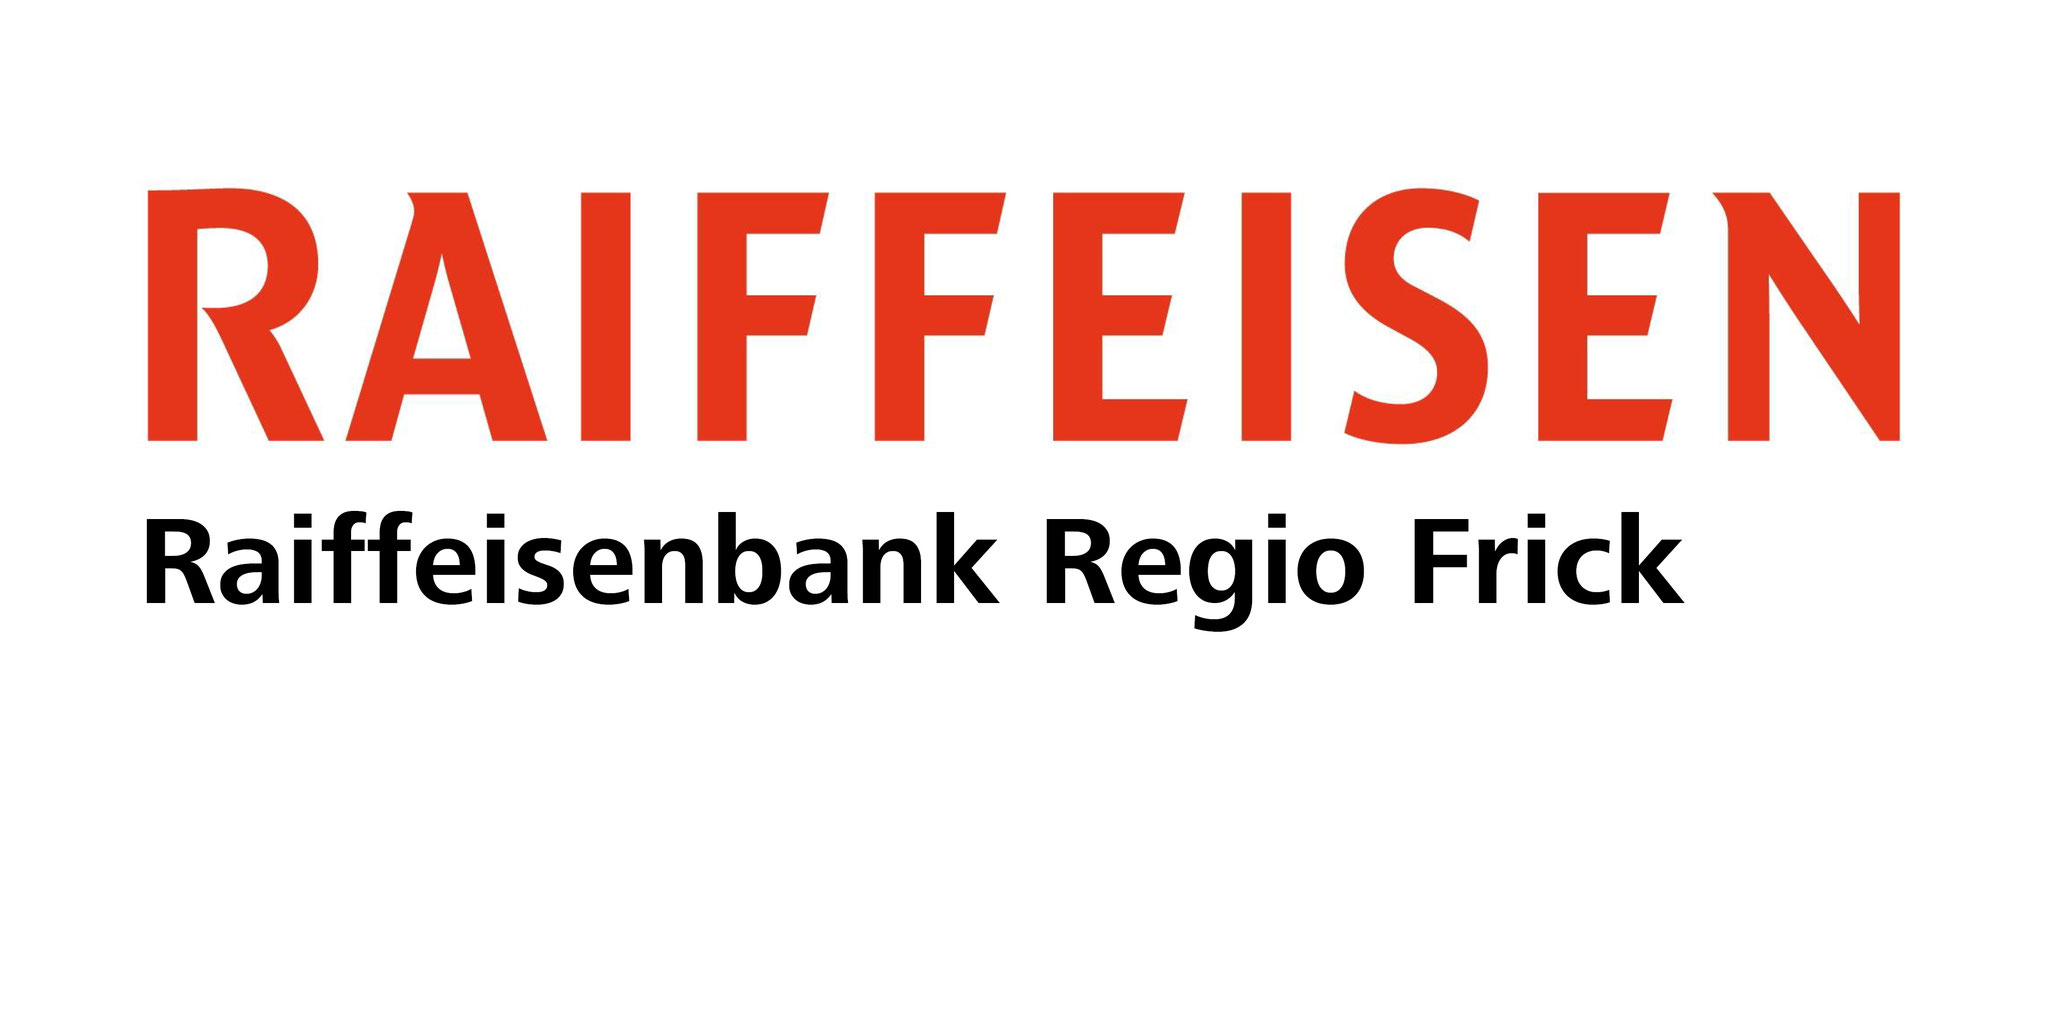 Raiffeisen Bank, Frick